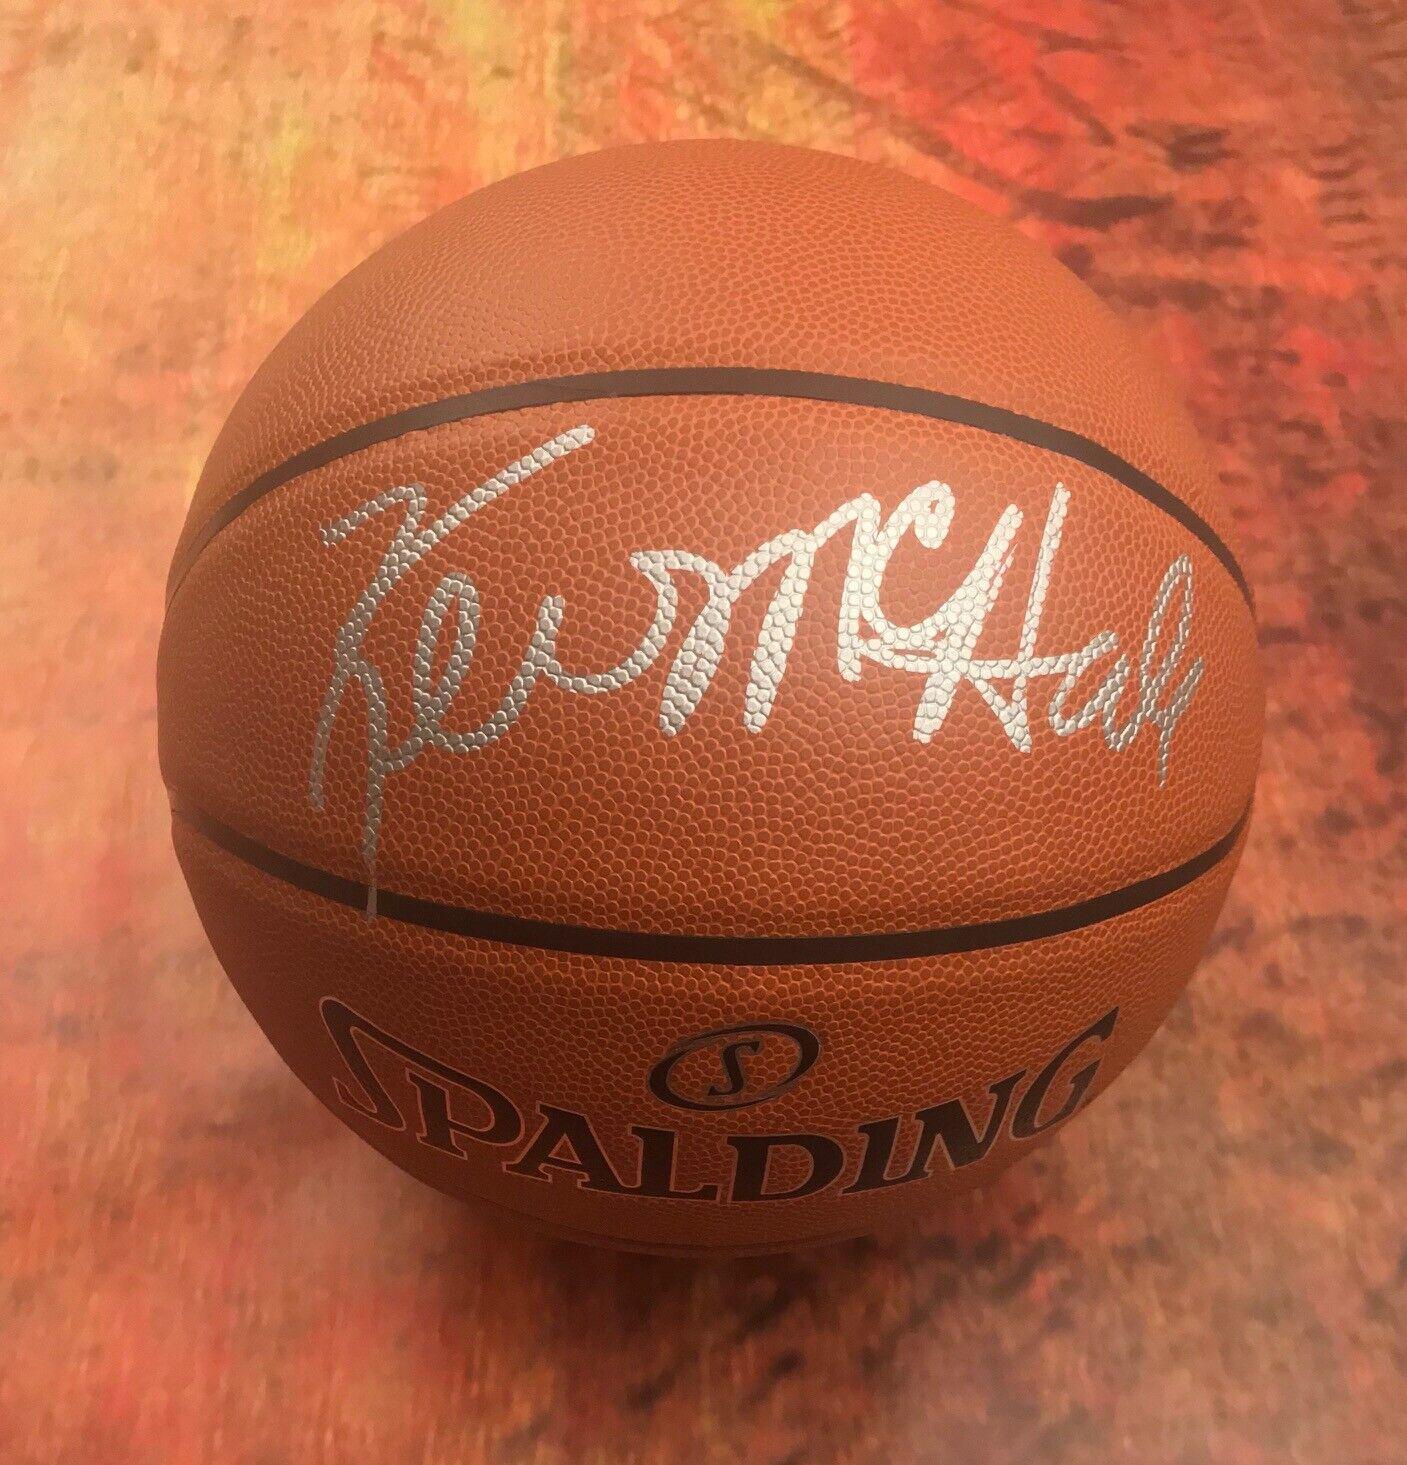 GFA Boston Celtics Hof All-Star Kevin Mchale Autographe Signé Basketball Coa